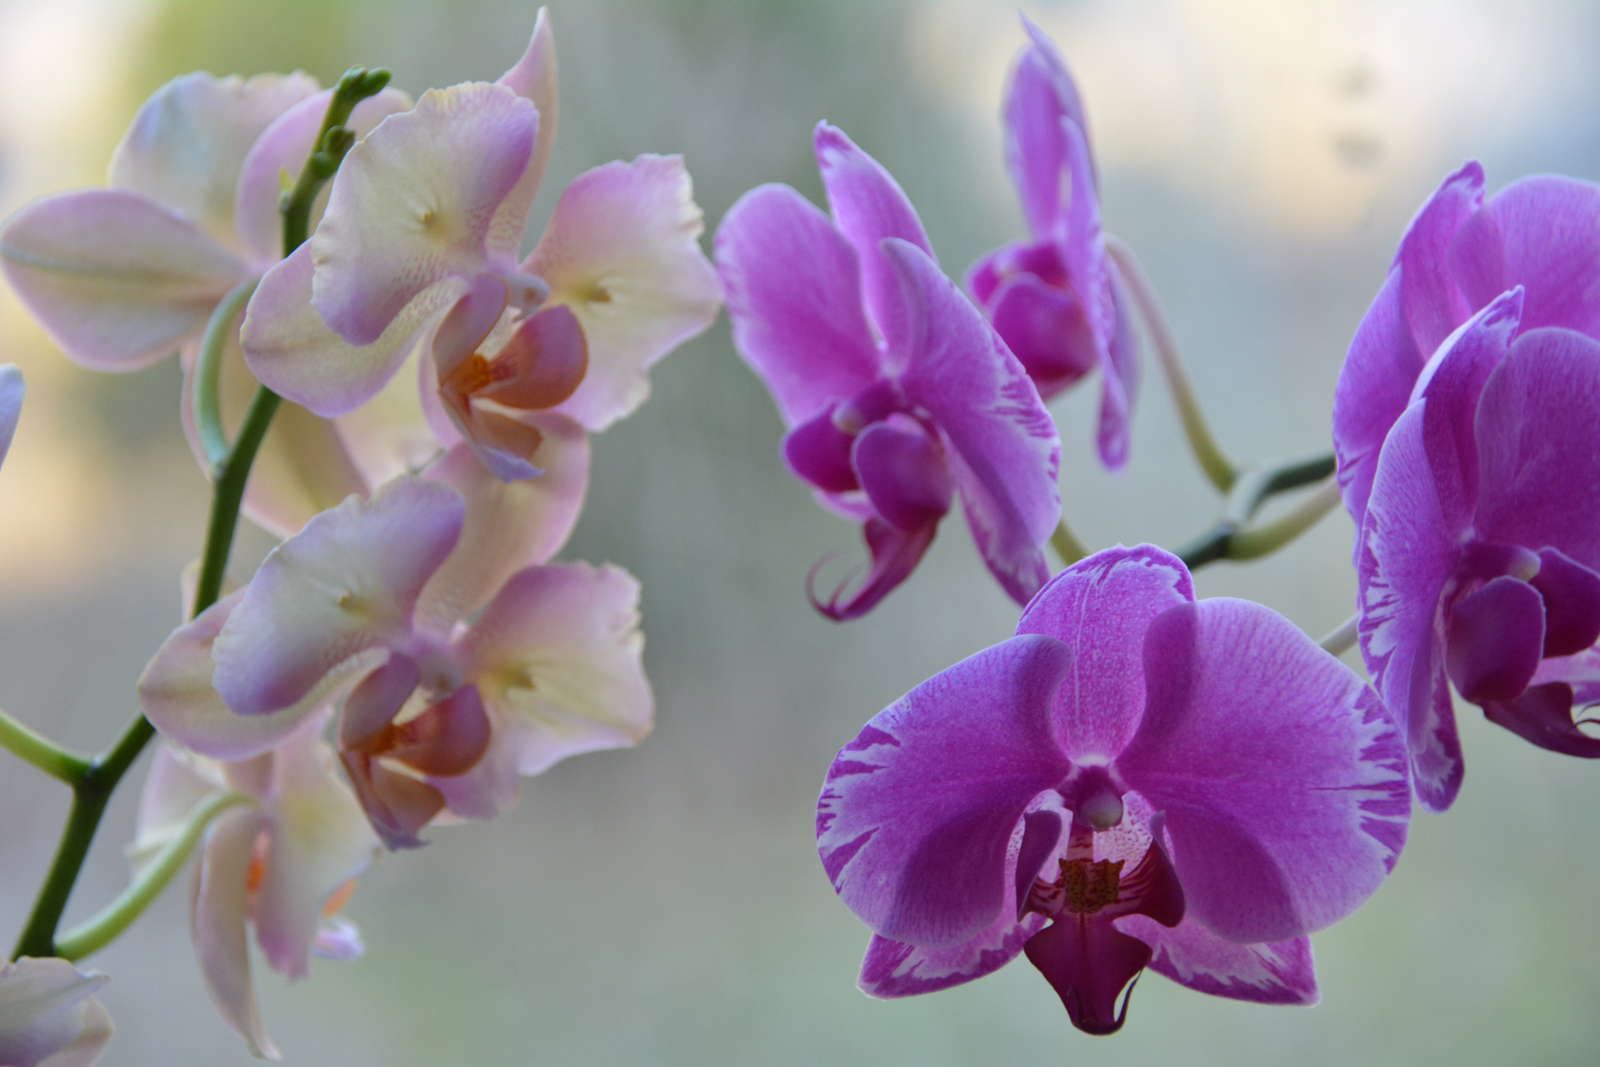 orchideen richtig d ngen anleitung tipps vom experten. Black Bedroom Furniture Sets. Home Design Ideas